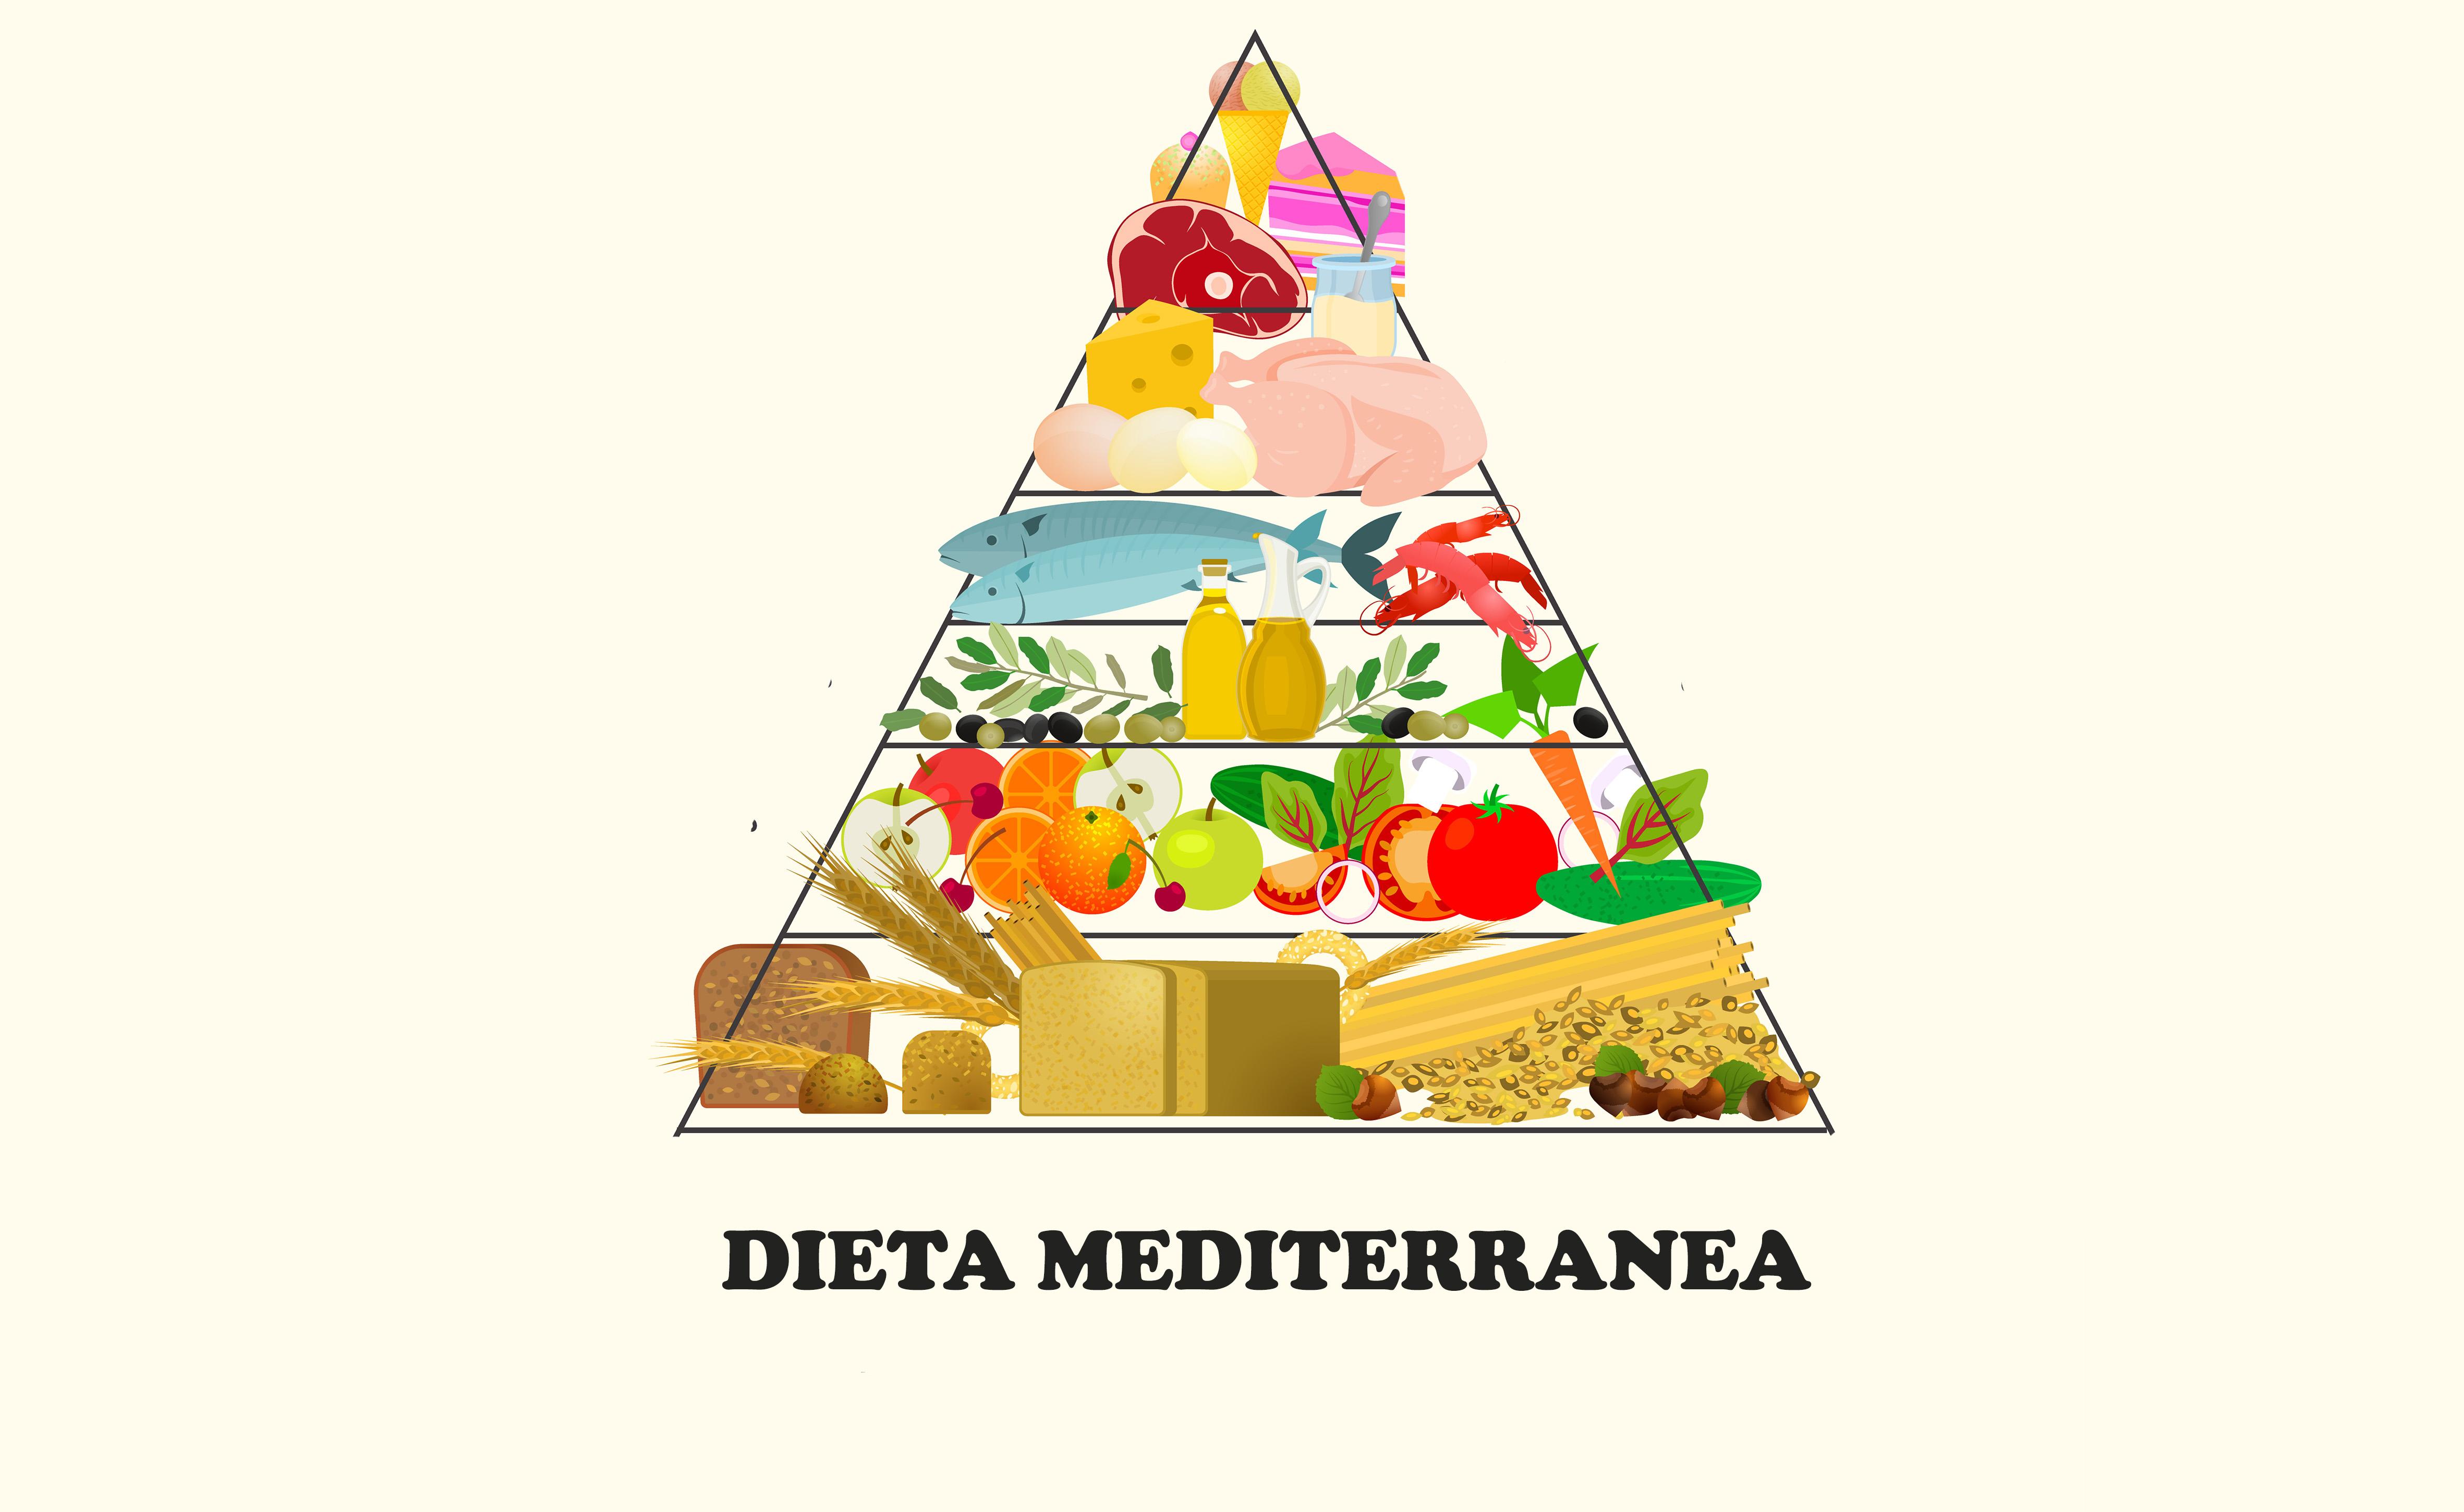 La dieta mediterranea per sconfiggere la demenza - La mediterranea ...